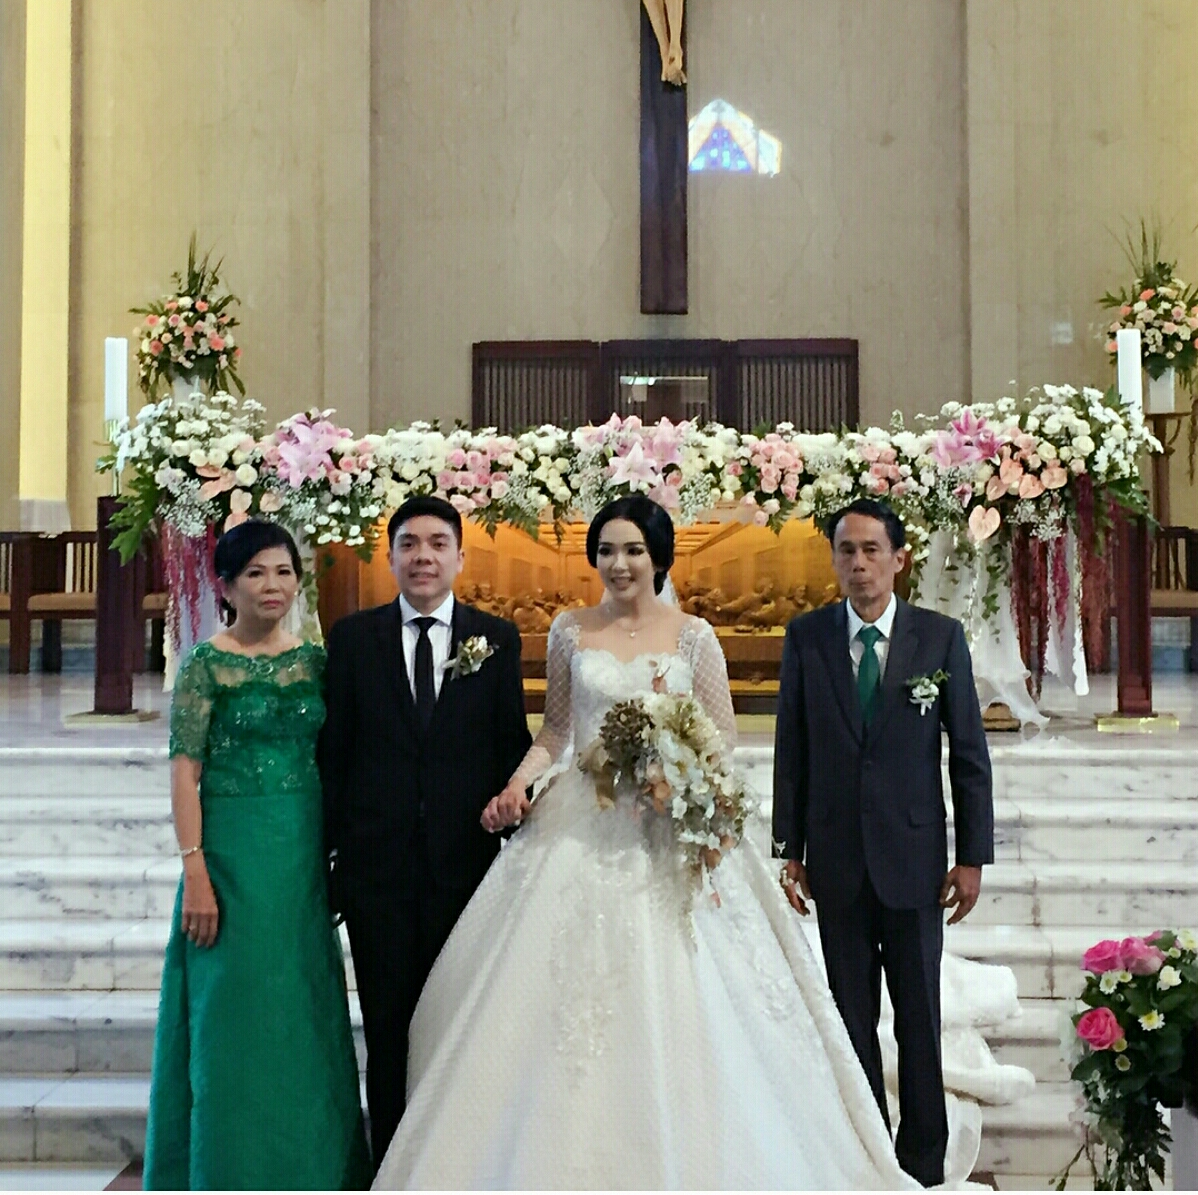 Wedding Mrmicheal Mrslinda By Ventlee Groom Centre Houseofcuff Collar Bar Lapel Pin Bros Jas Best Man Skull Silver